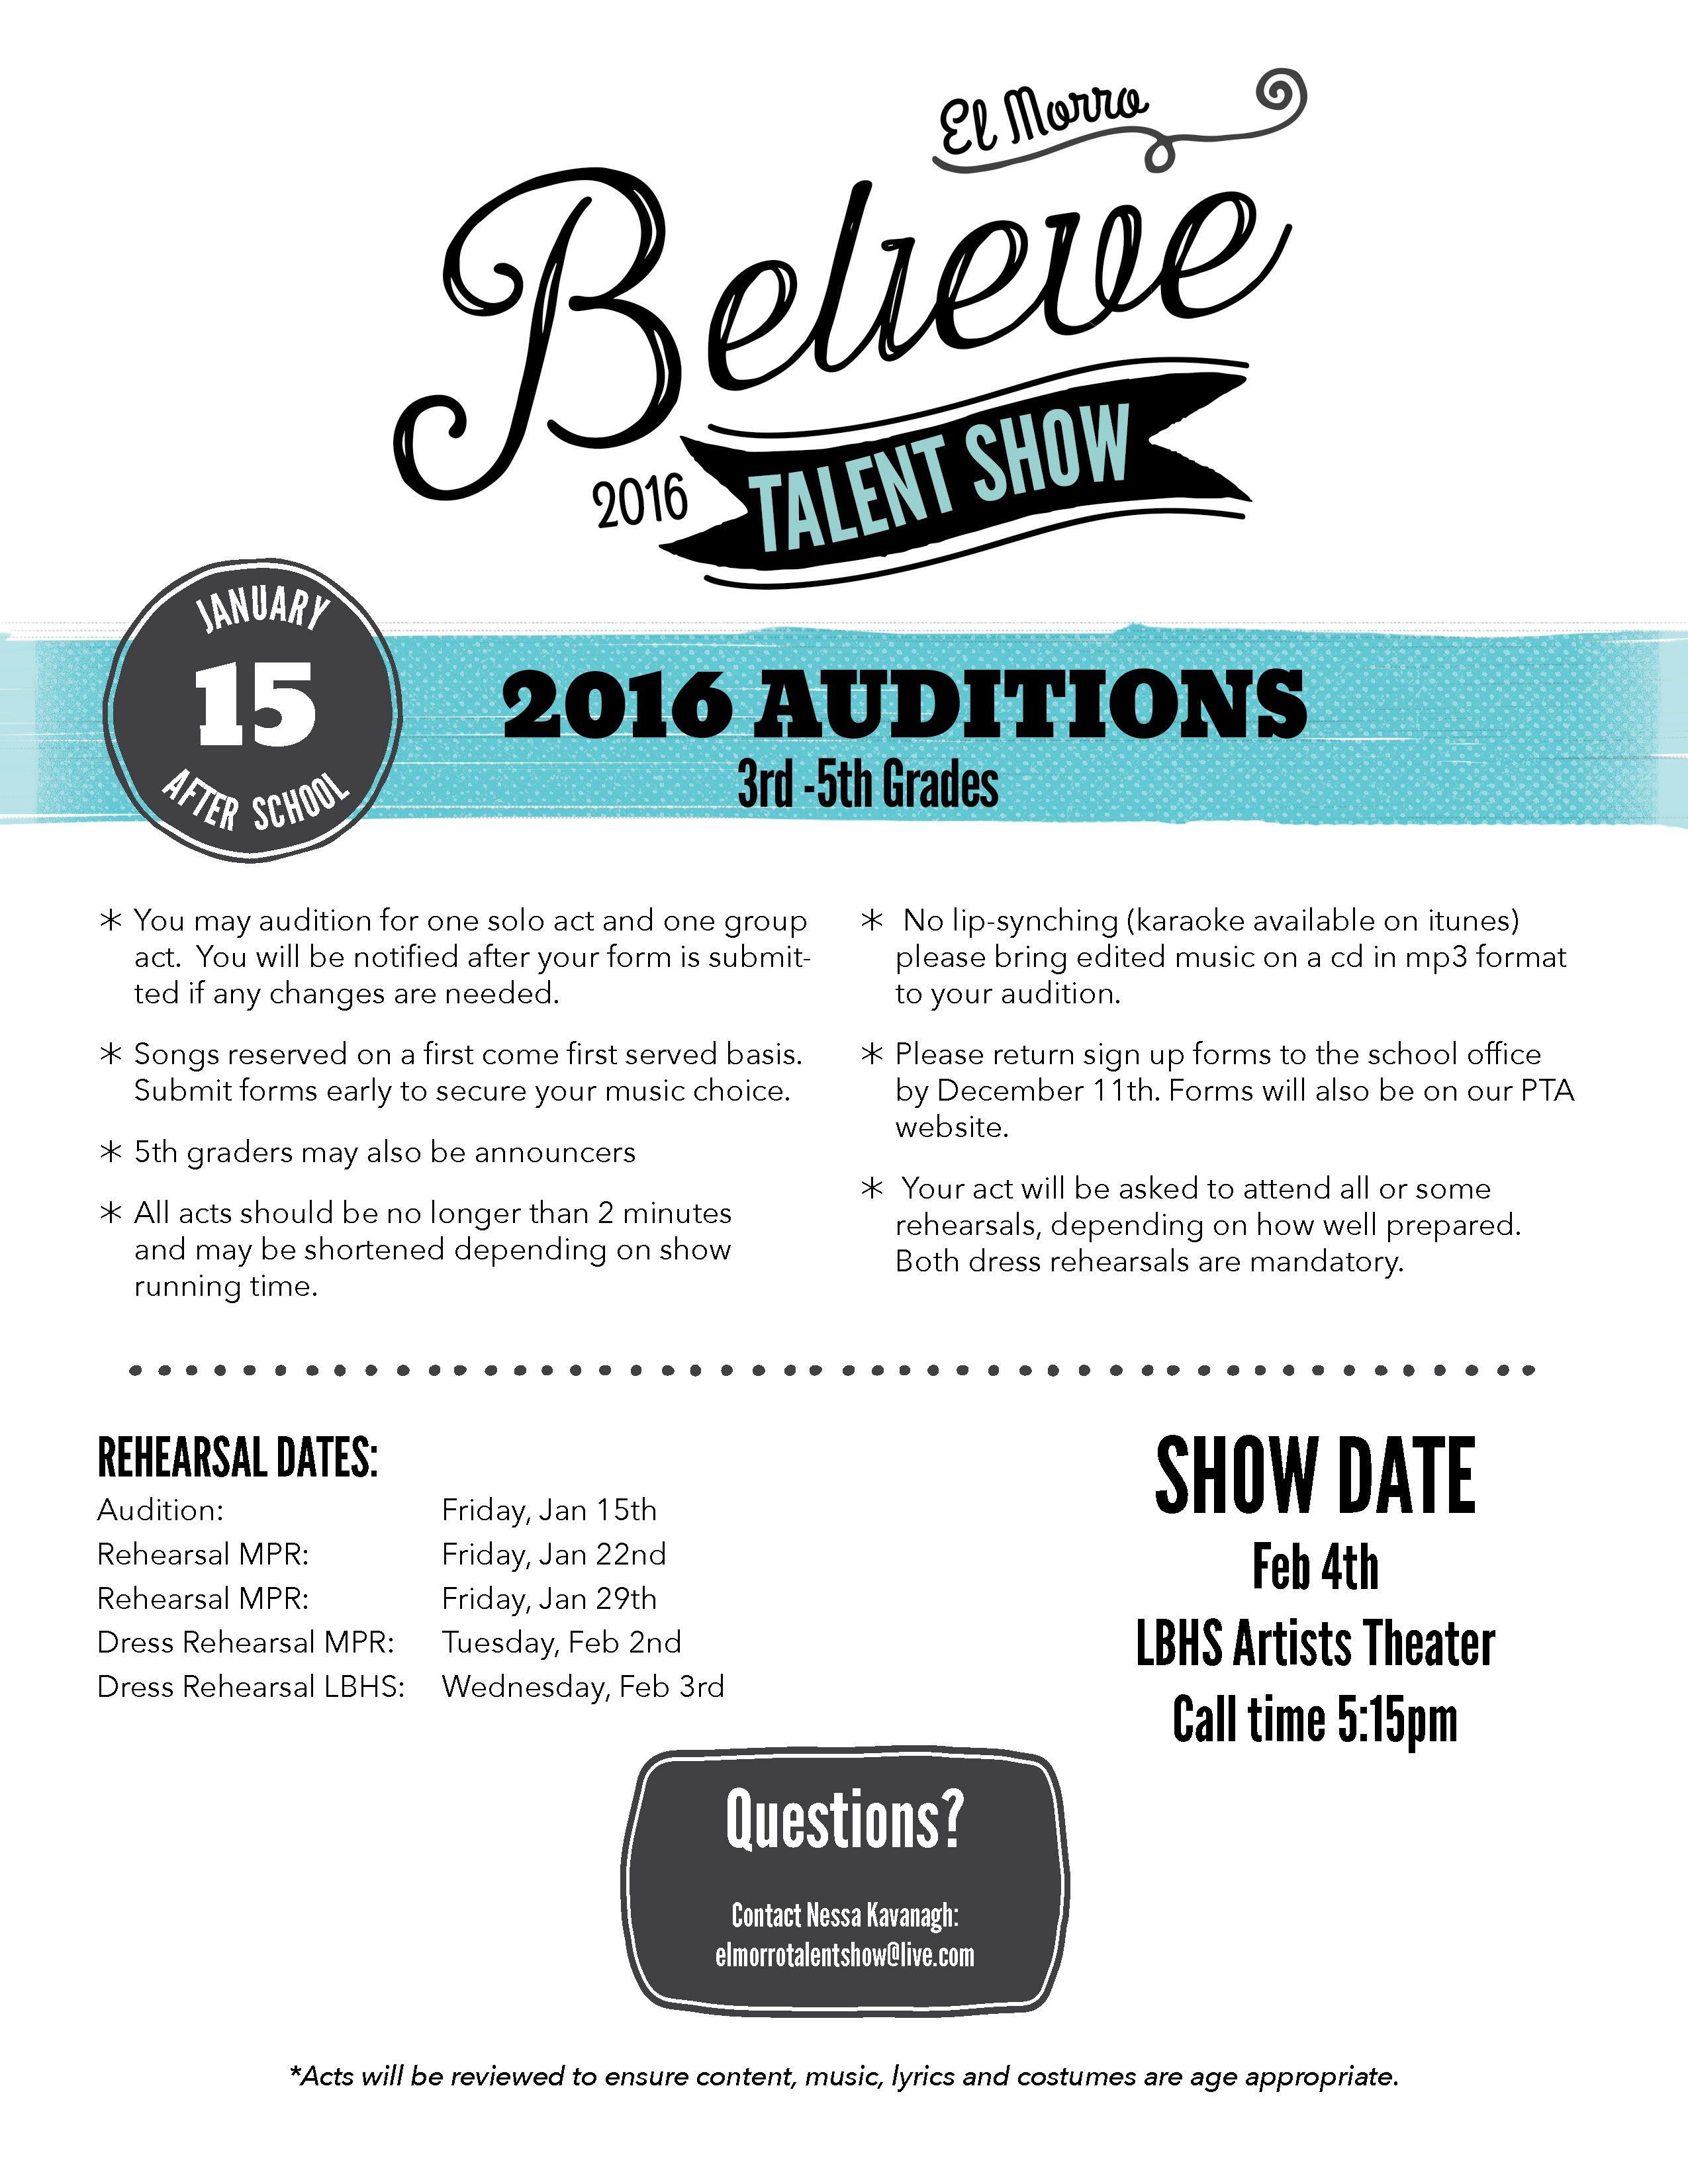 Elementary School Talent Show Rules